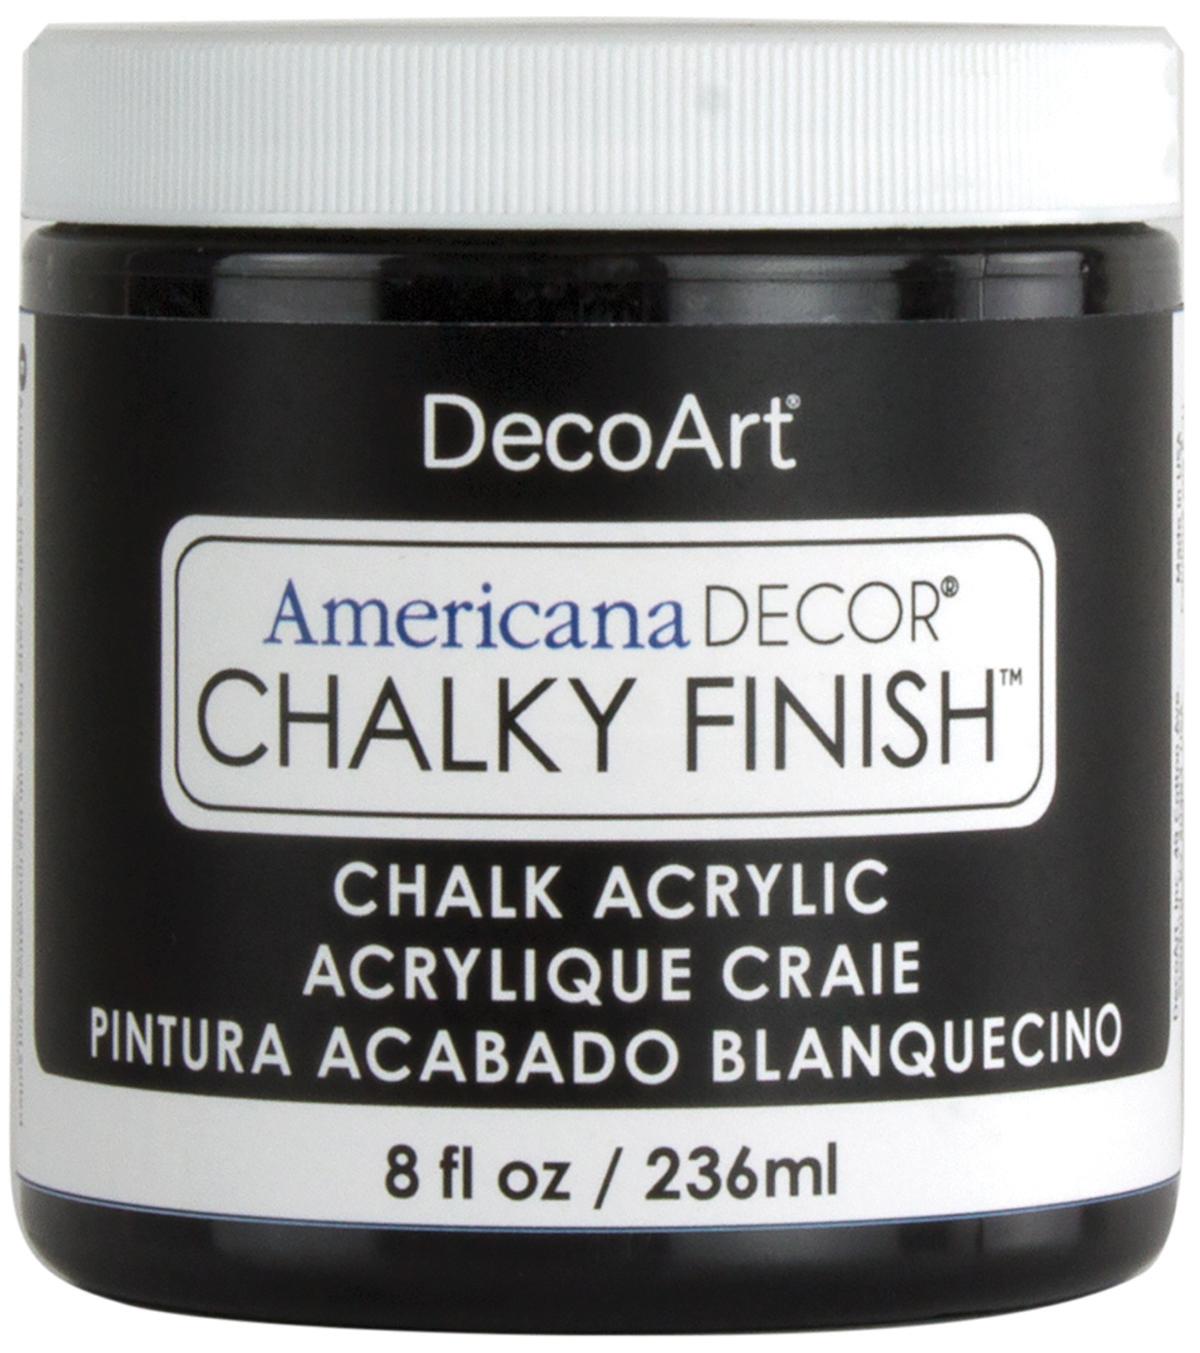 Decoart 8 Oz Carbon Americana Decor Chalky Finish Paint